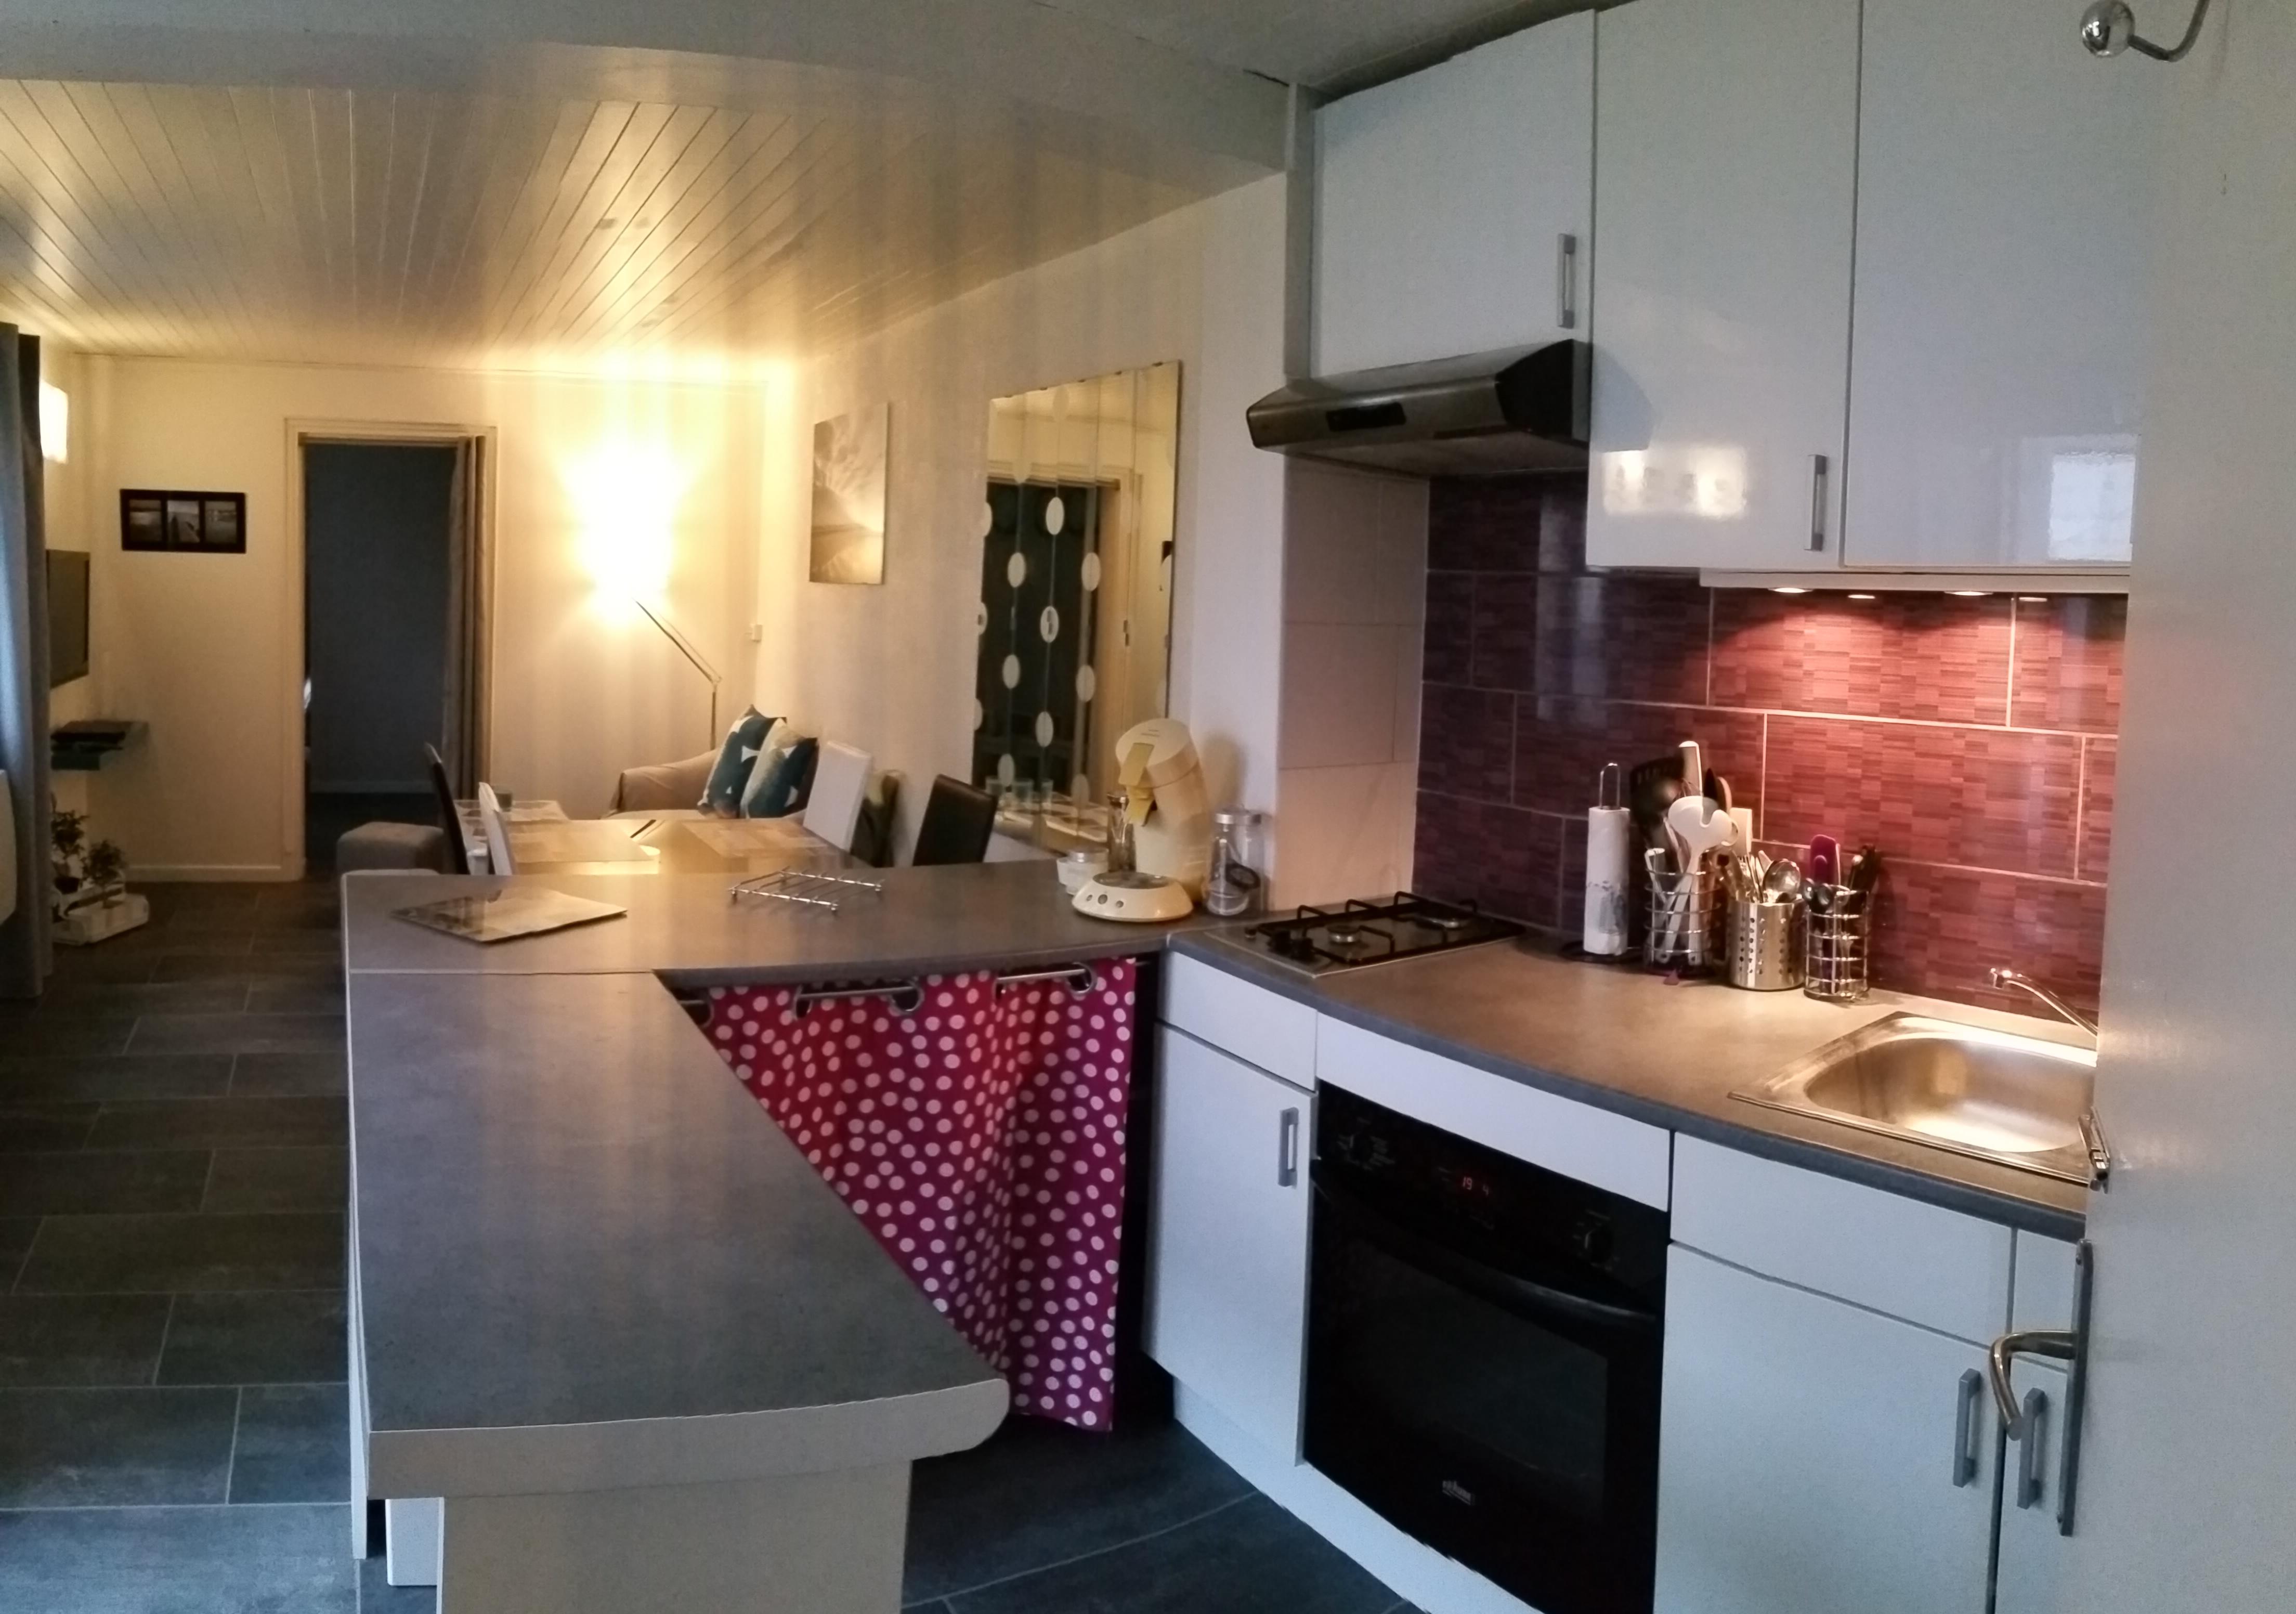 Le crotoy location gite vacances 2 4 personnes for Configuration cuisine equipee